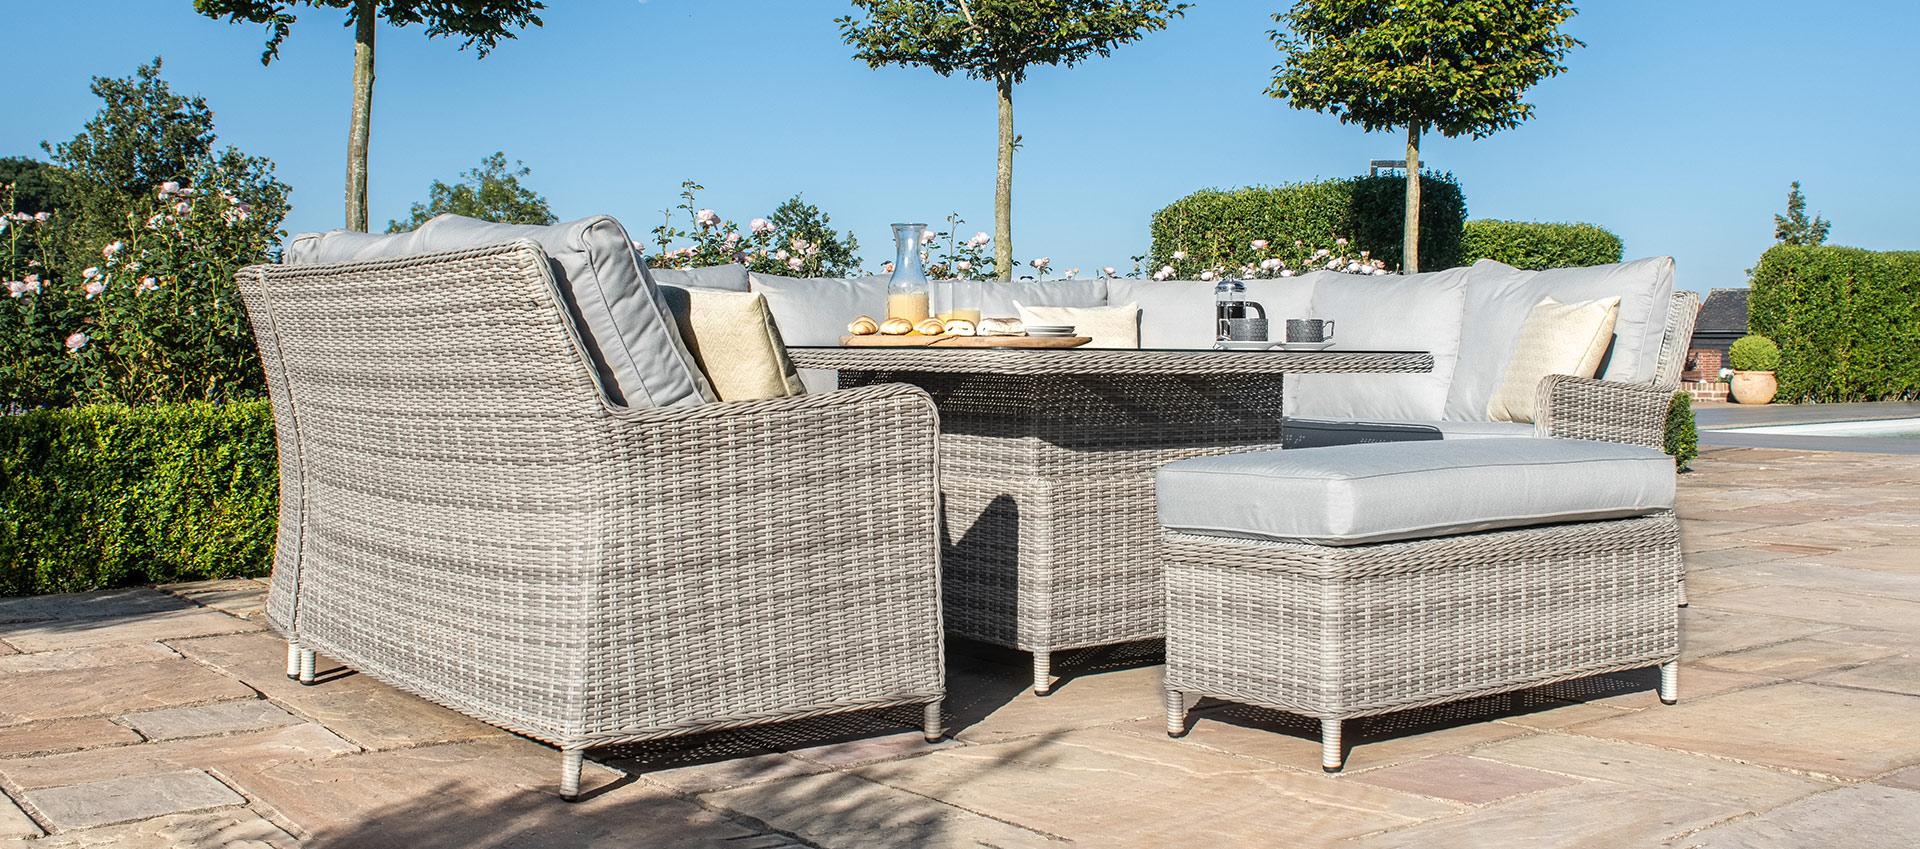 Maze Rattan - Oxford Royal U Shaped Sofa Set - With Rising Table